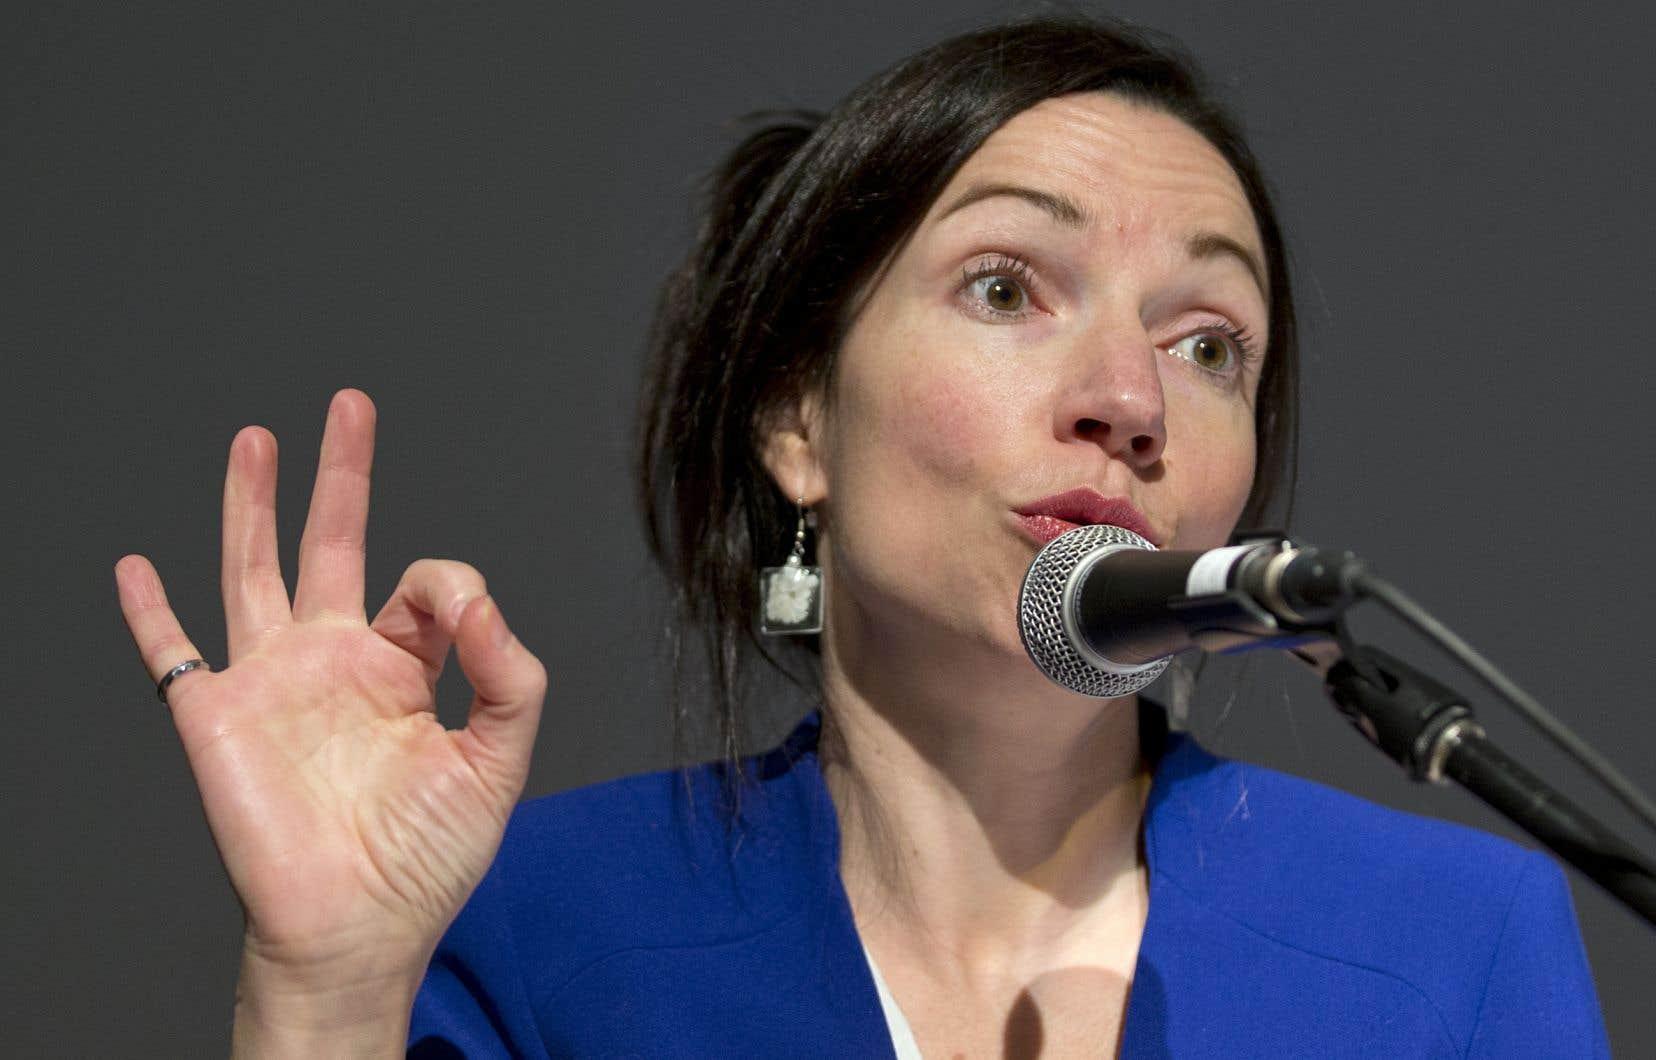 Martine Ouellet met en demeure Radio-Canada